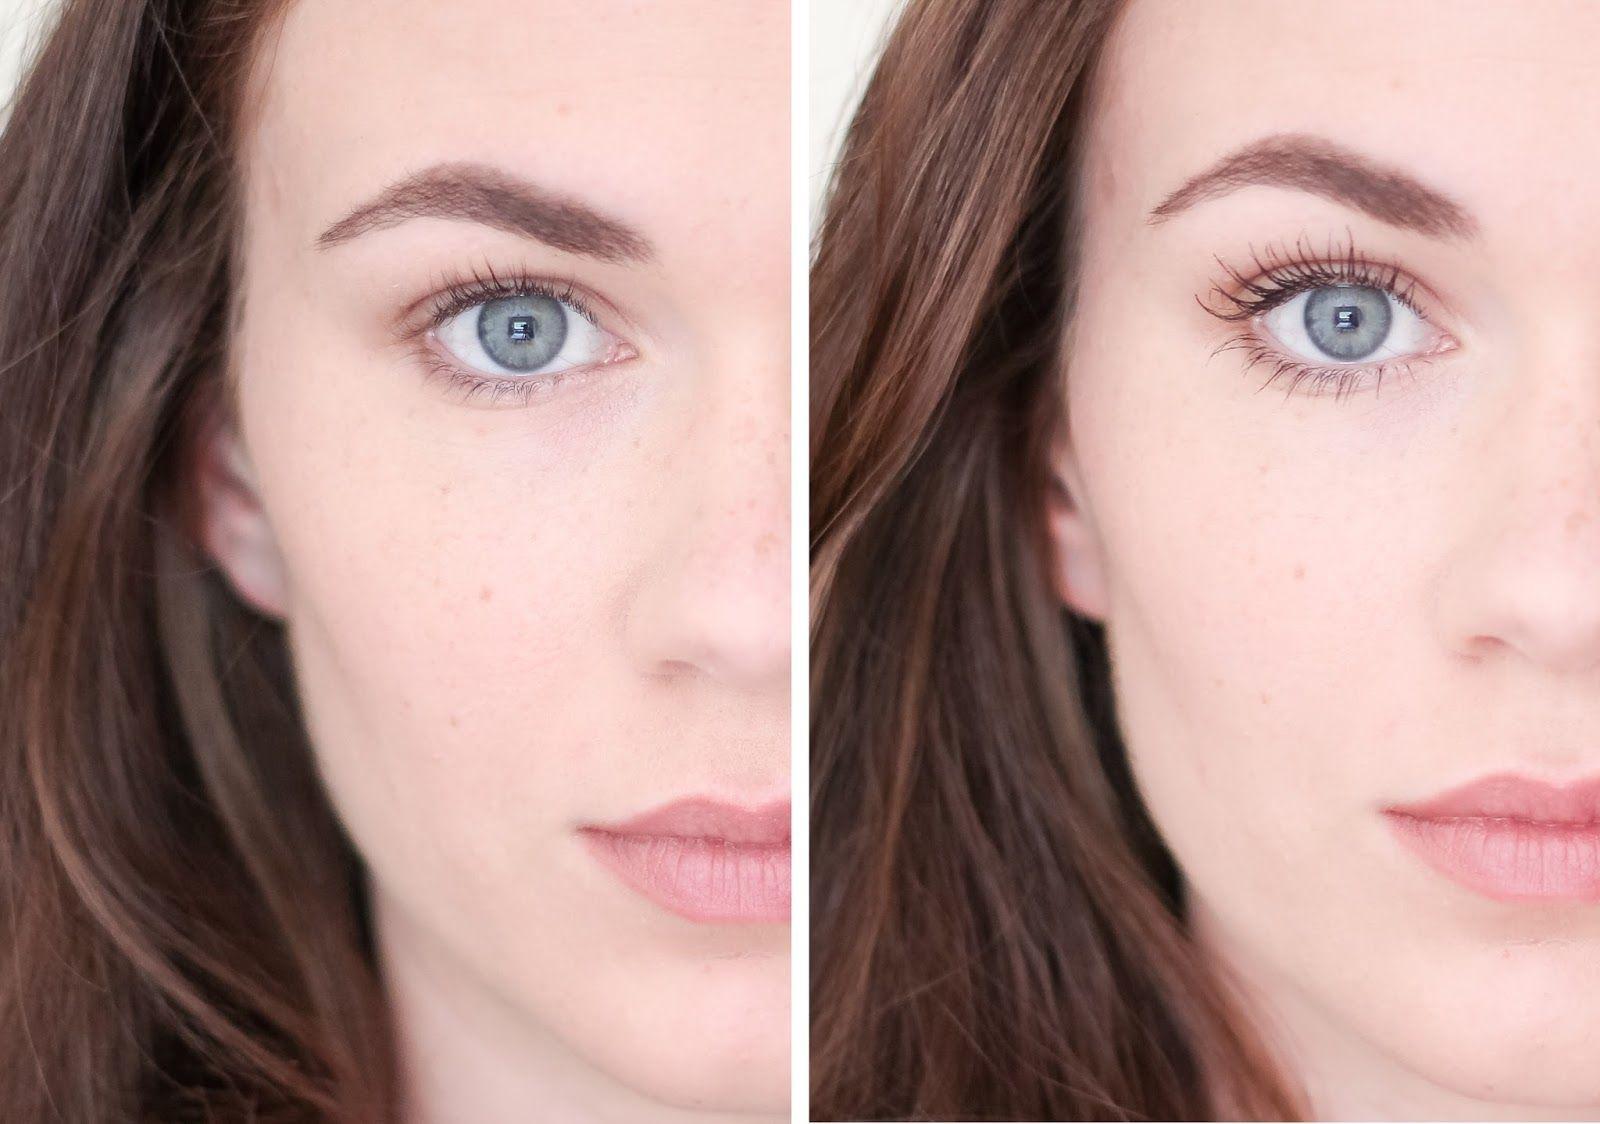 997b81cb660 No7 Dramatic Lift Mascara Review | eye makeup | Mascara review ...